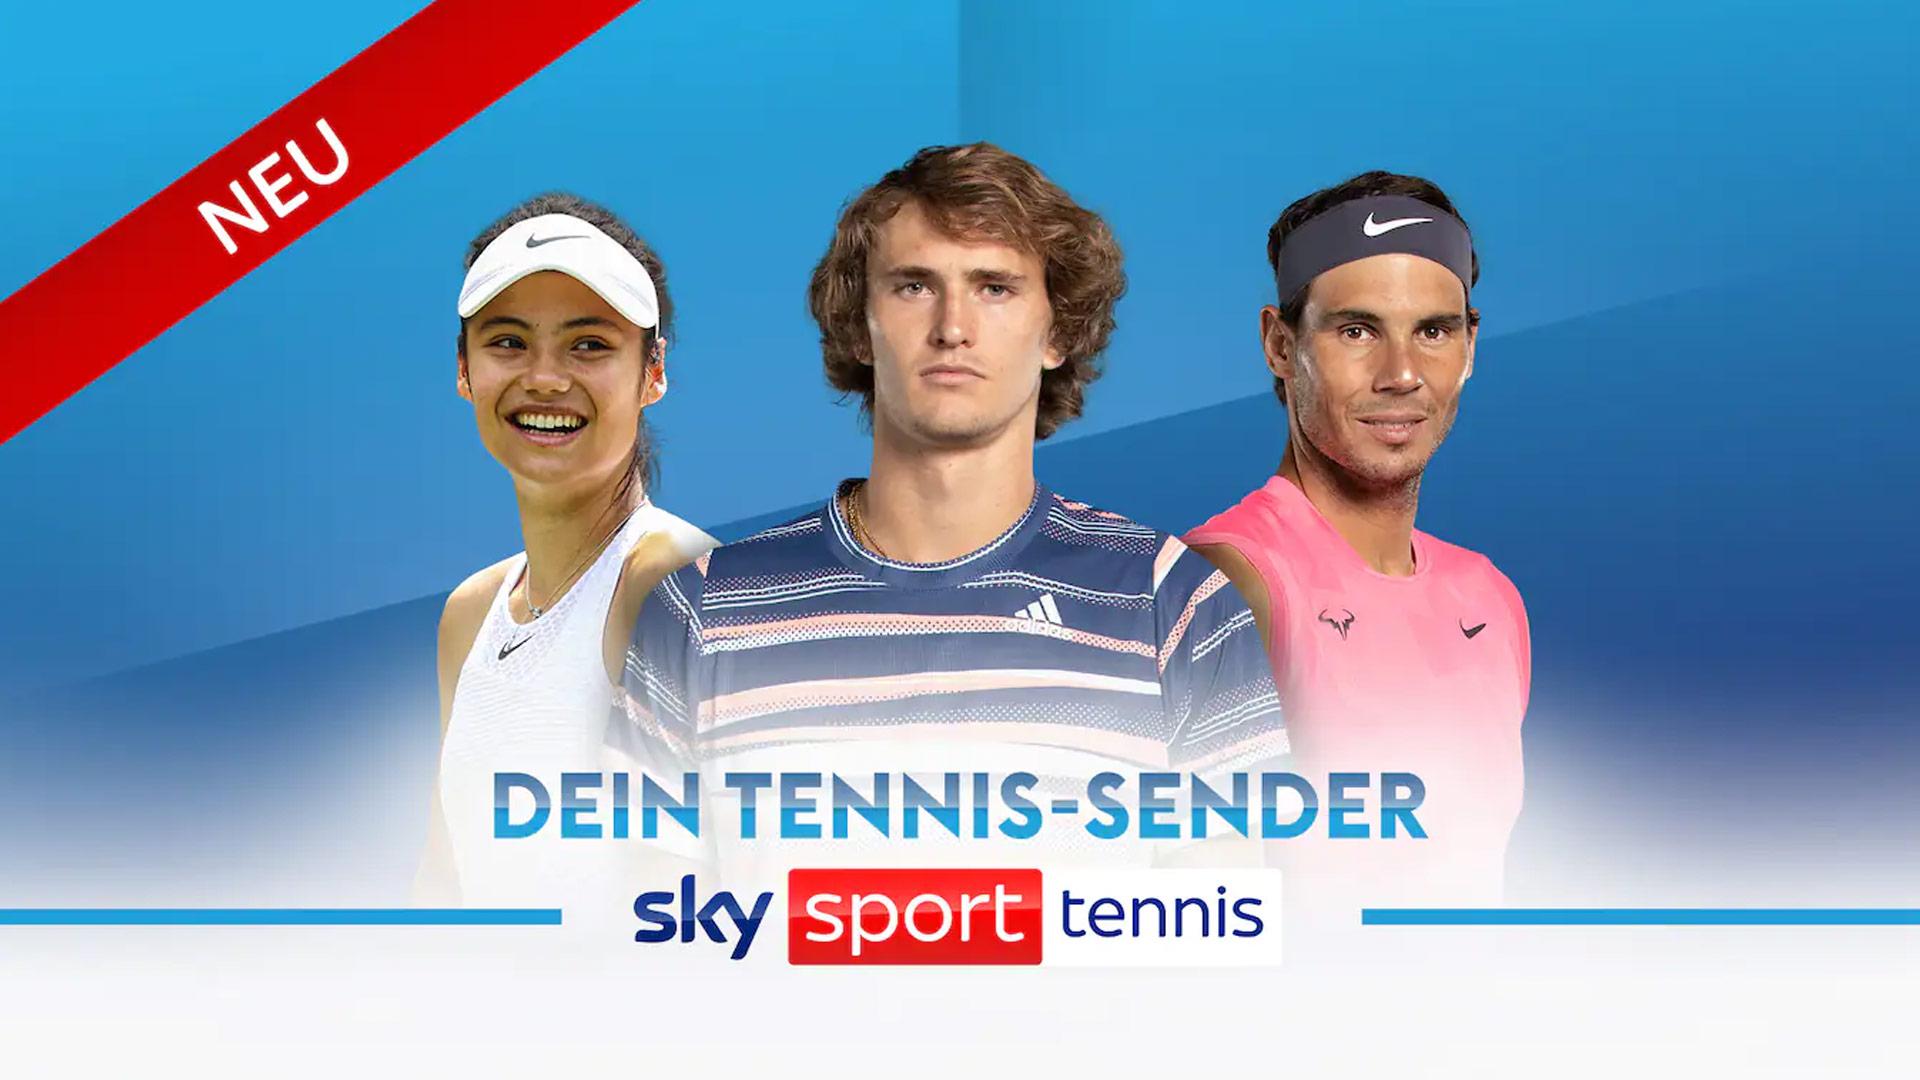 Sky Sport Tennis